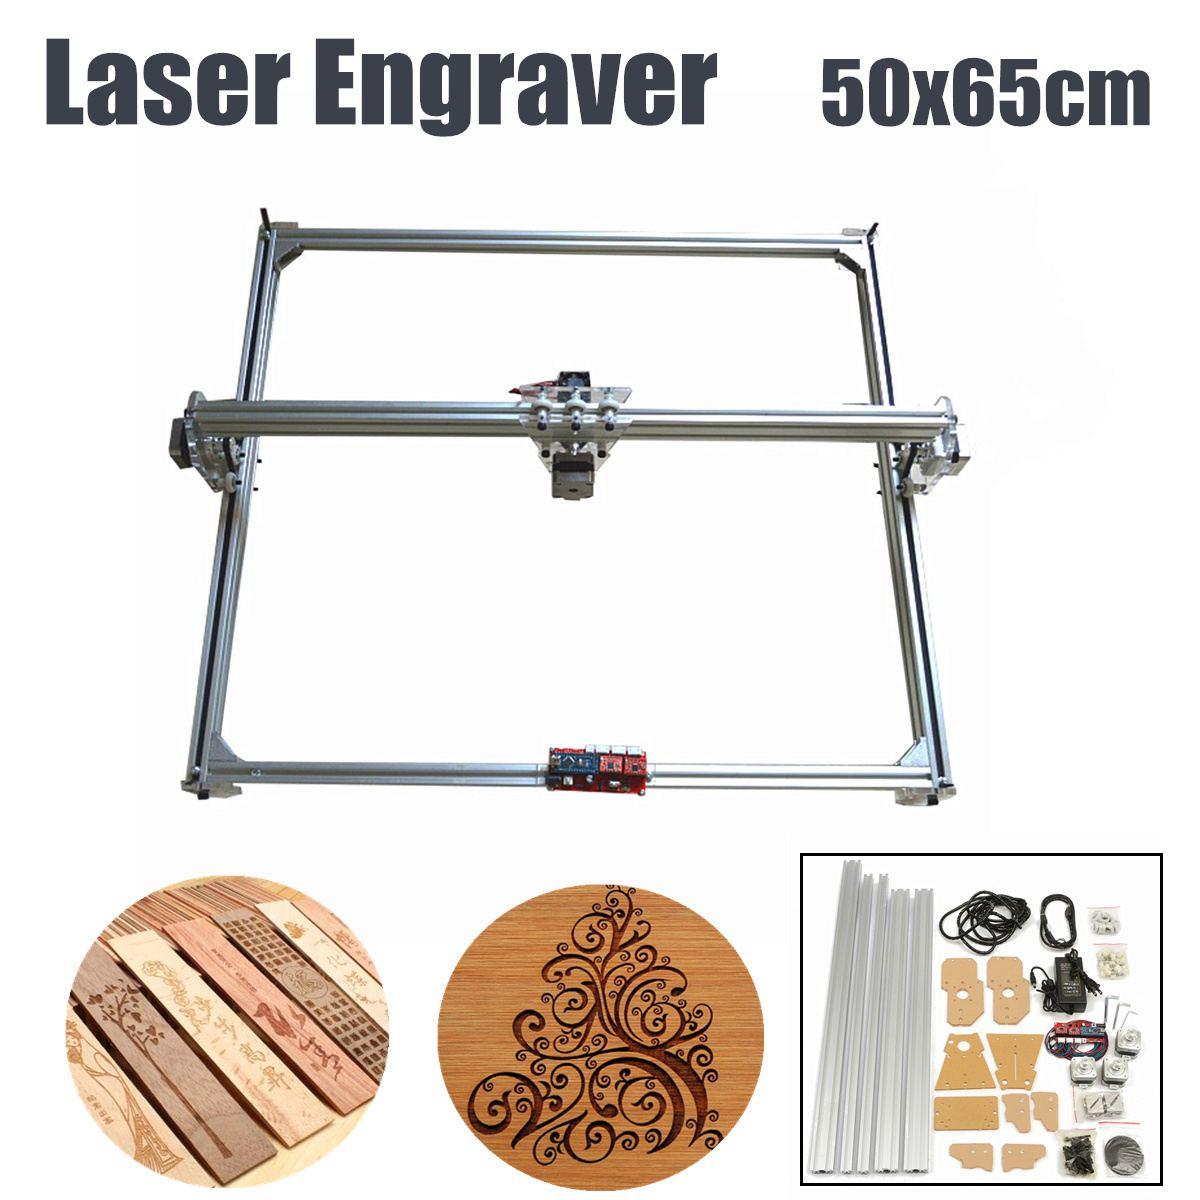 50*65cm 100mw-10W DIY Desktop Mini Laser Cutting/Engraving Engraver Machine DC 12V Wood Cutter/Printer/Power Adjustable